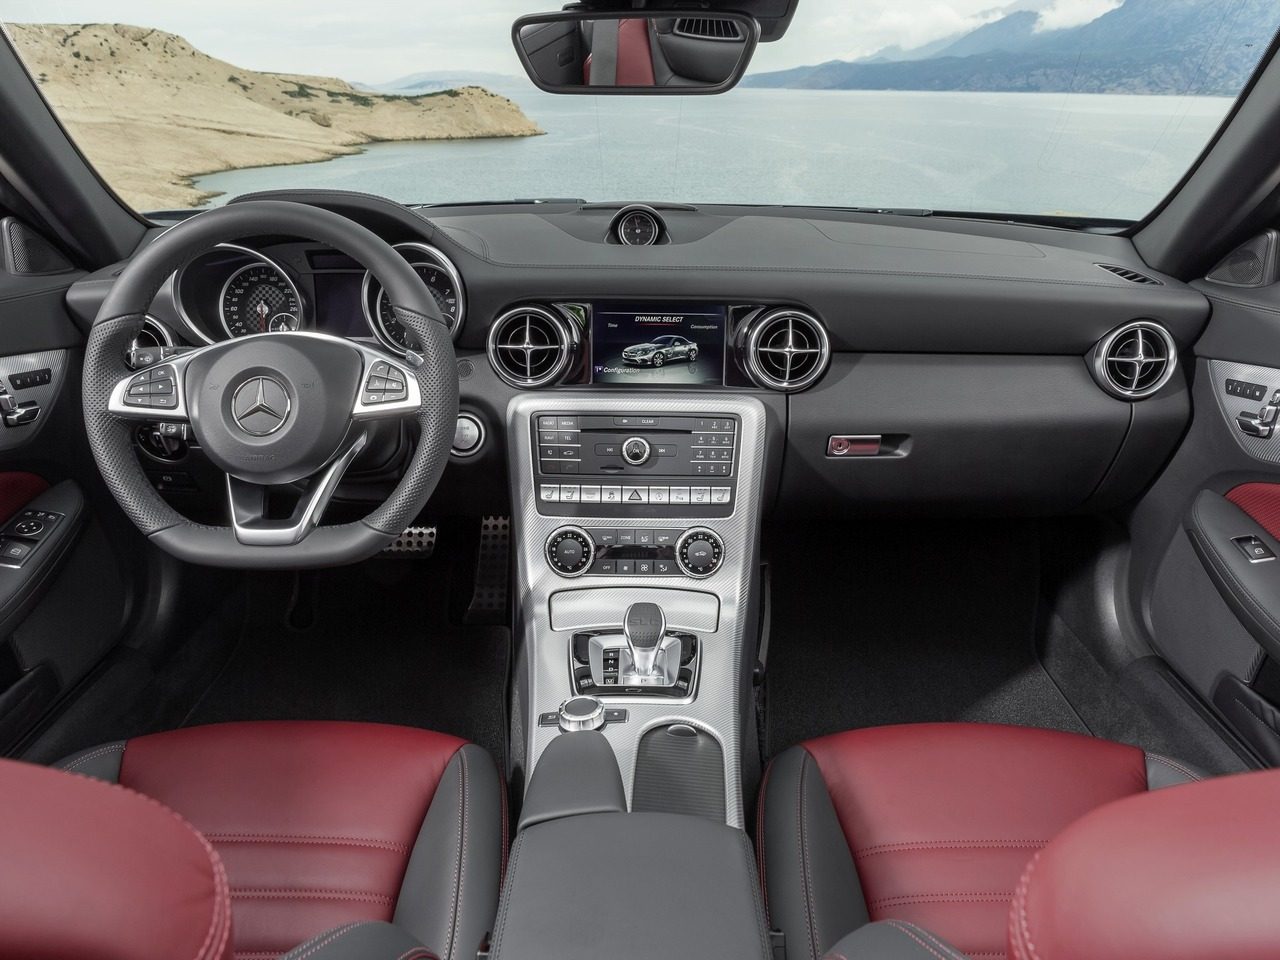 Снимки: Mercedes-benz SLC-klasse (R172)